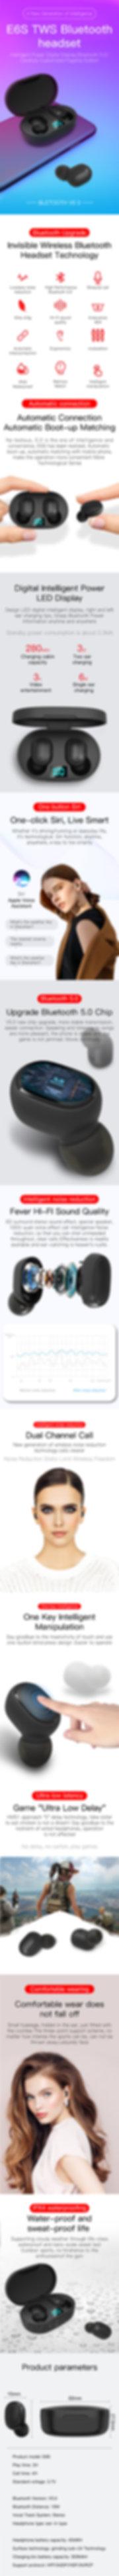 E6S耳机详情设计-英文.jpg